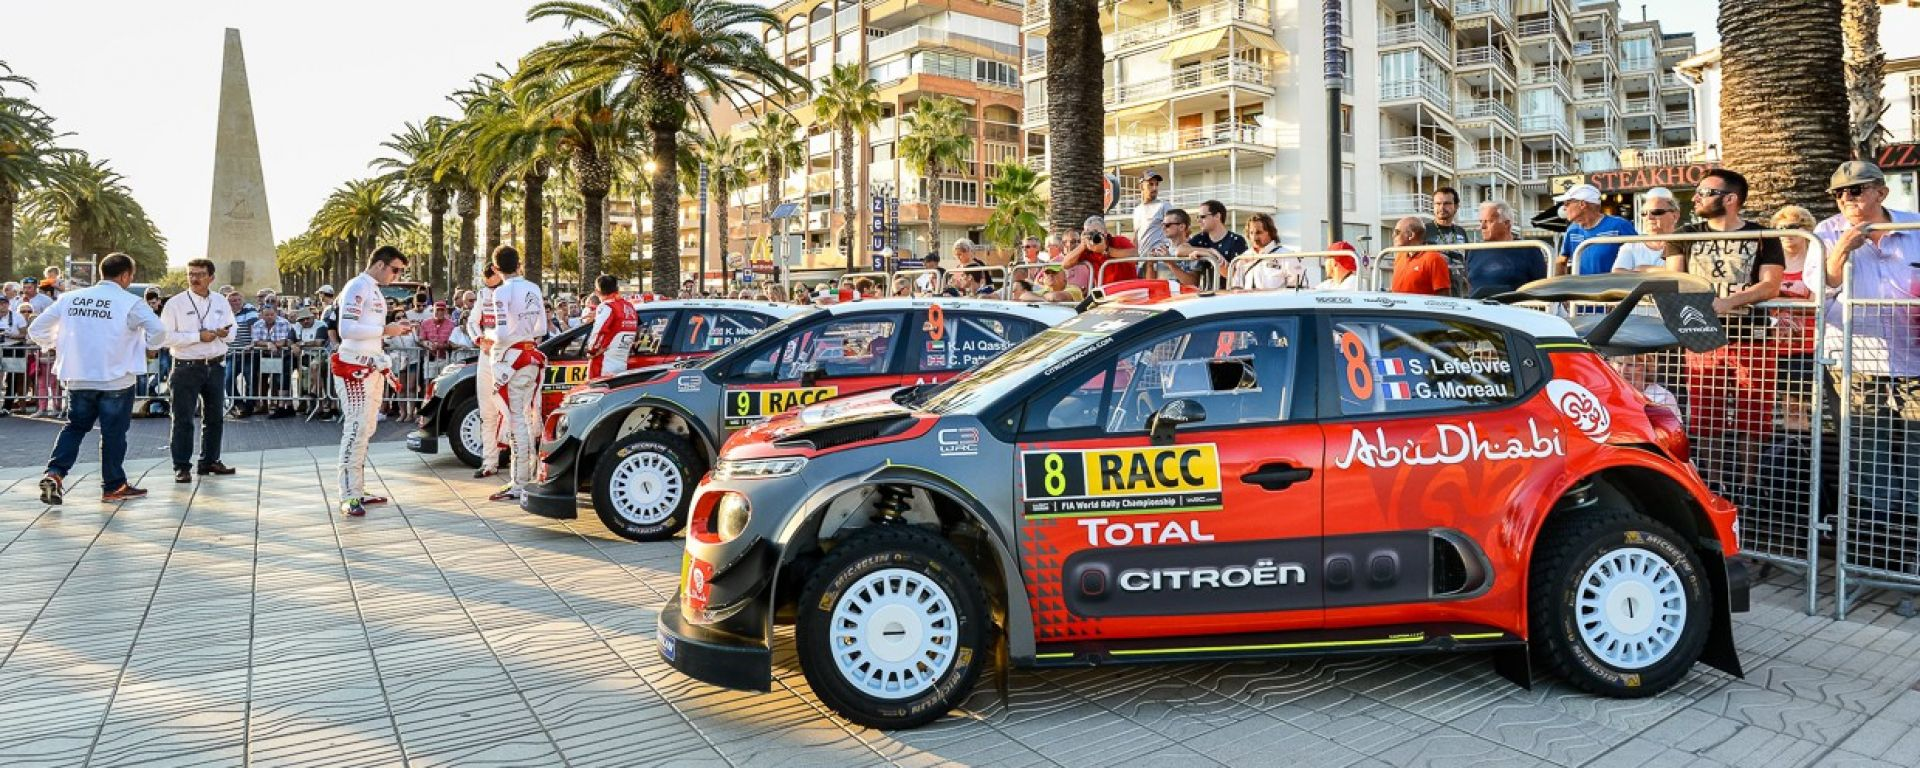 WRC 2017 - Rally Spagna 2017